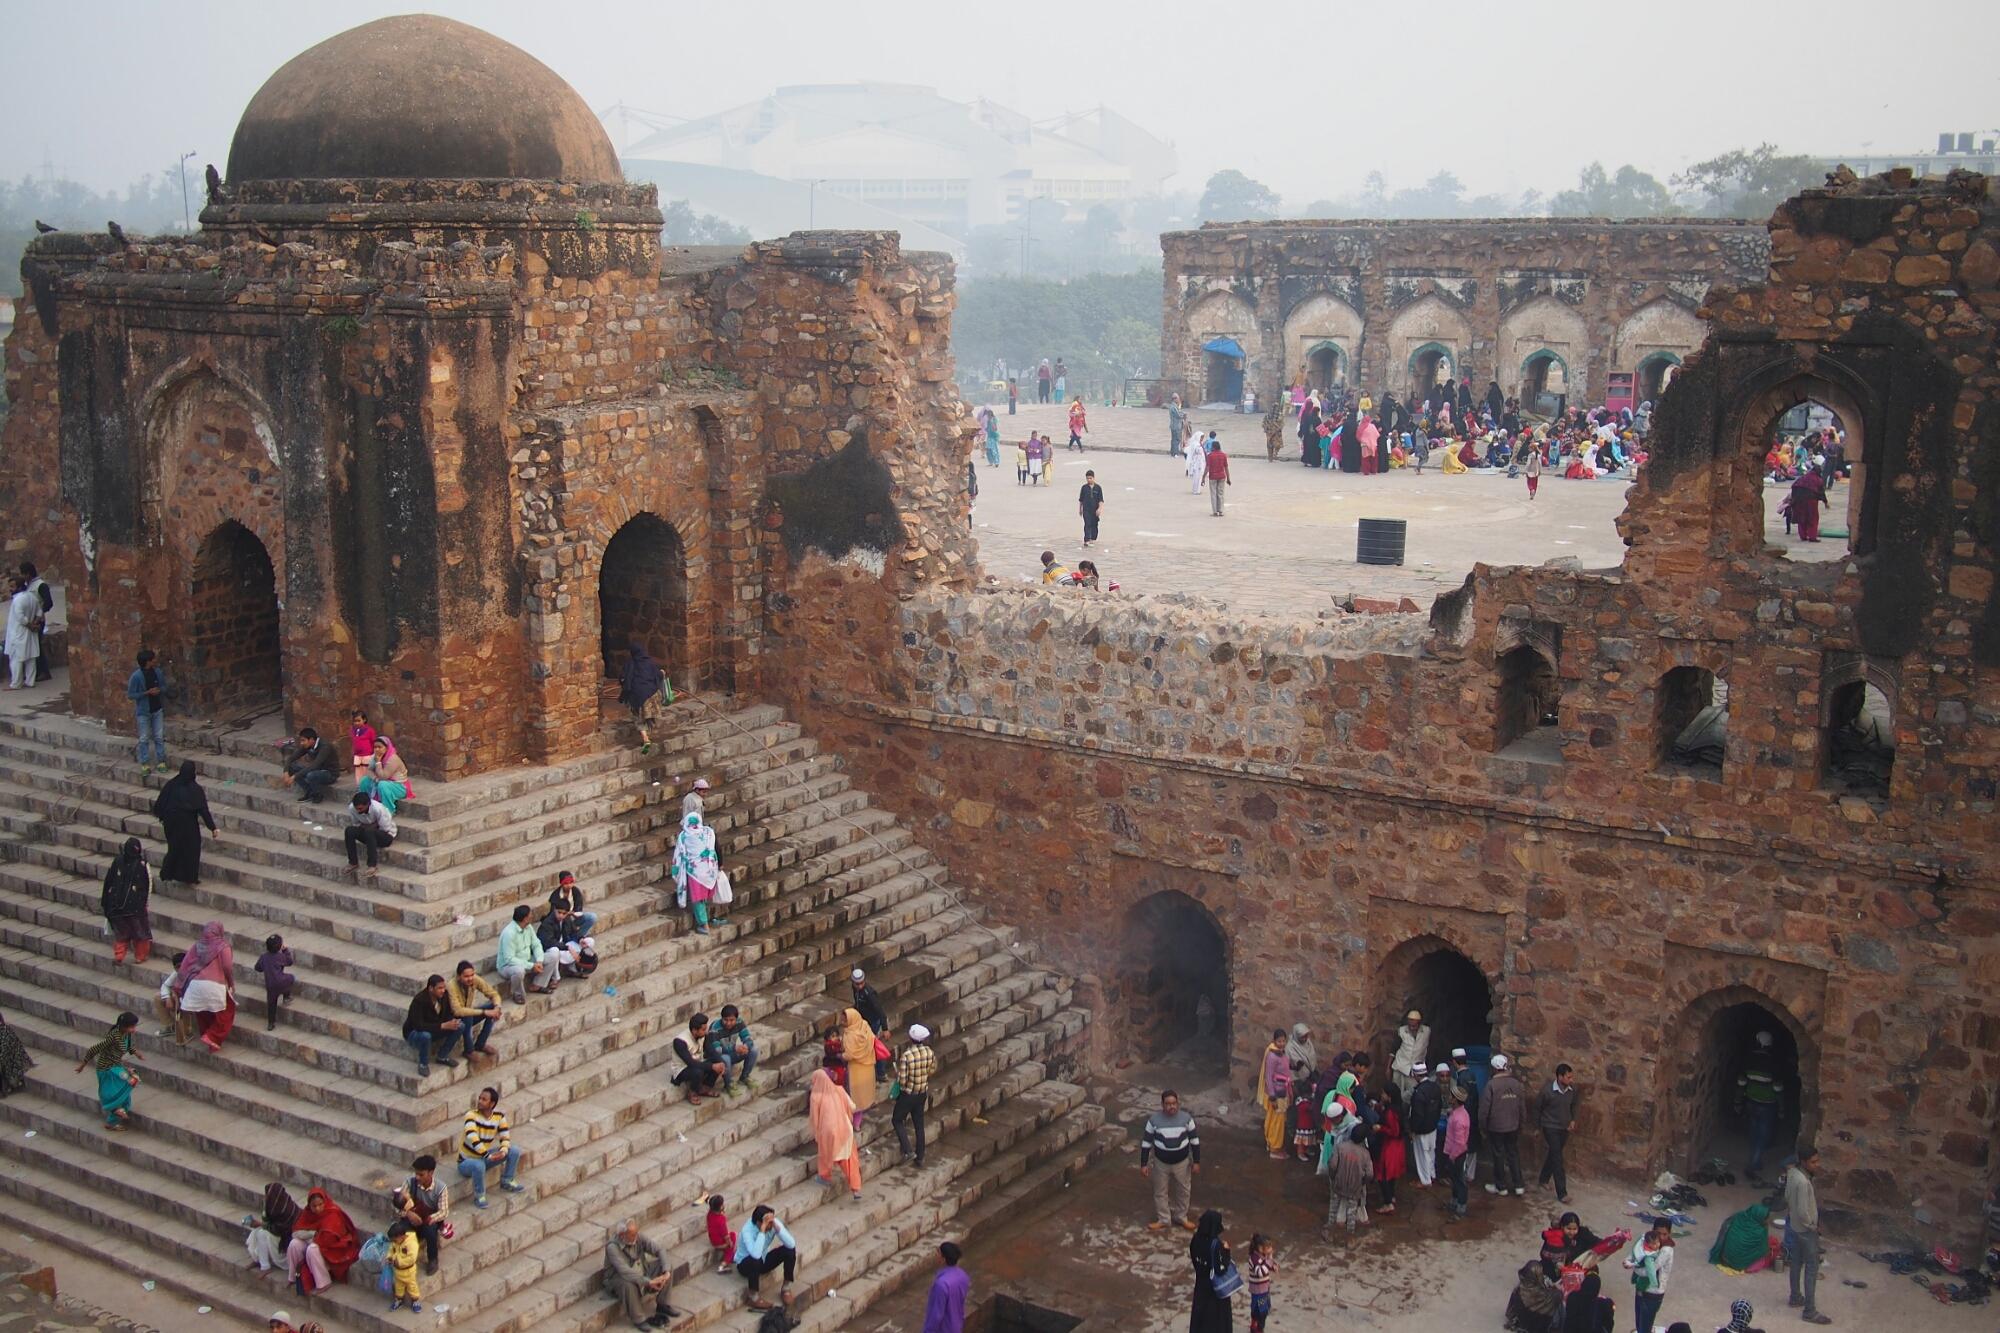 La mosquée en ruine de Feroz Shah Kotla